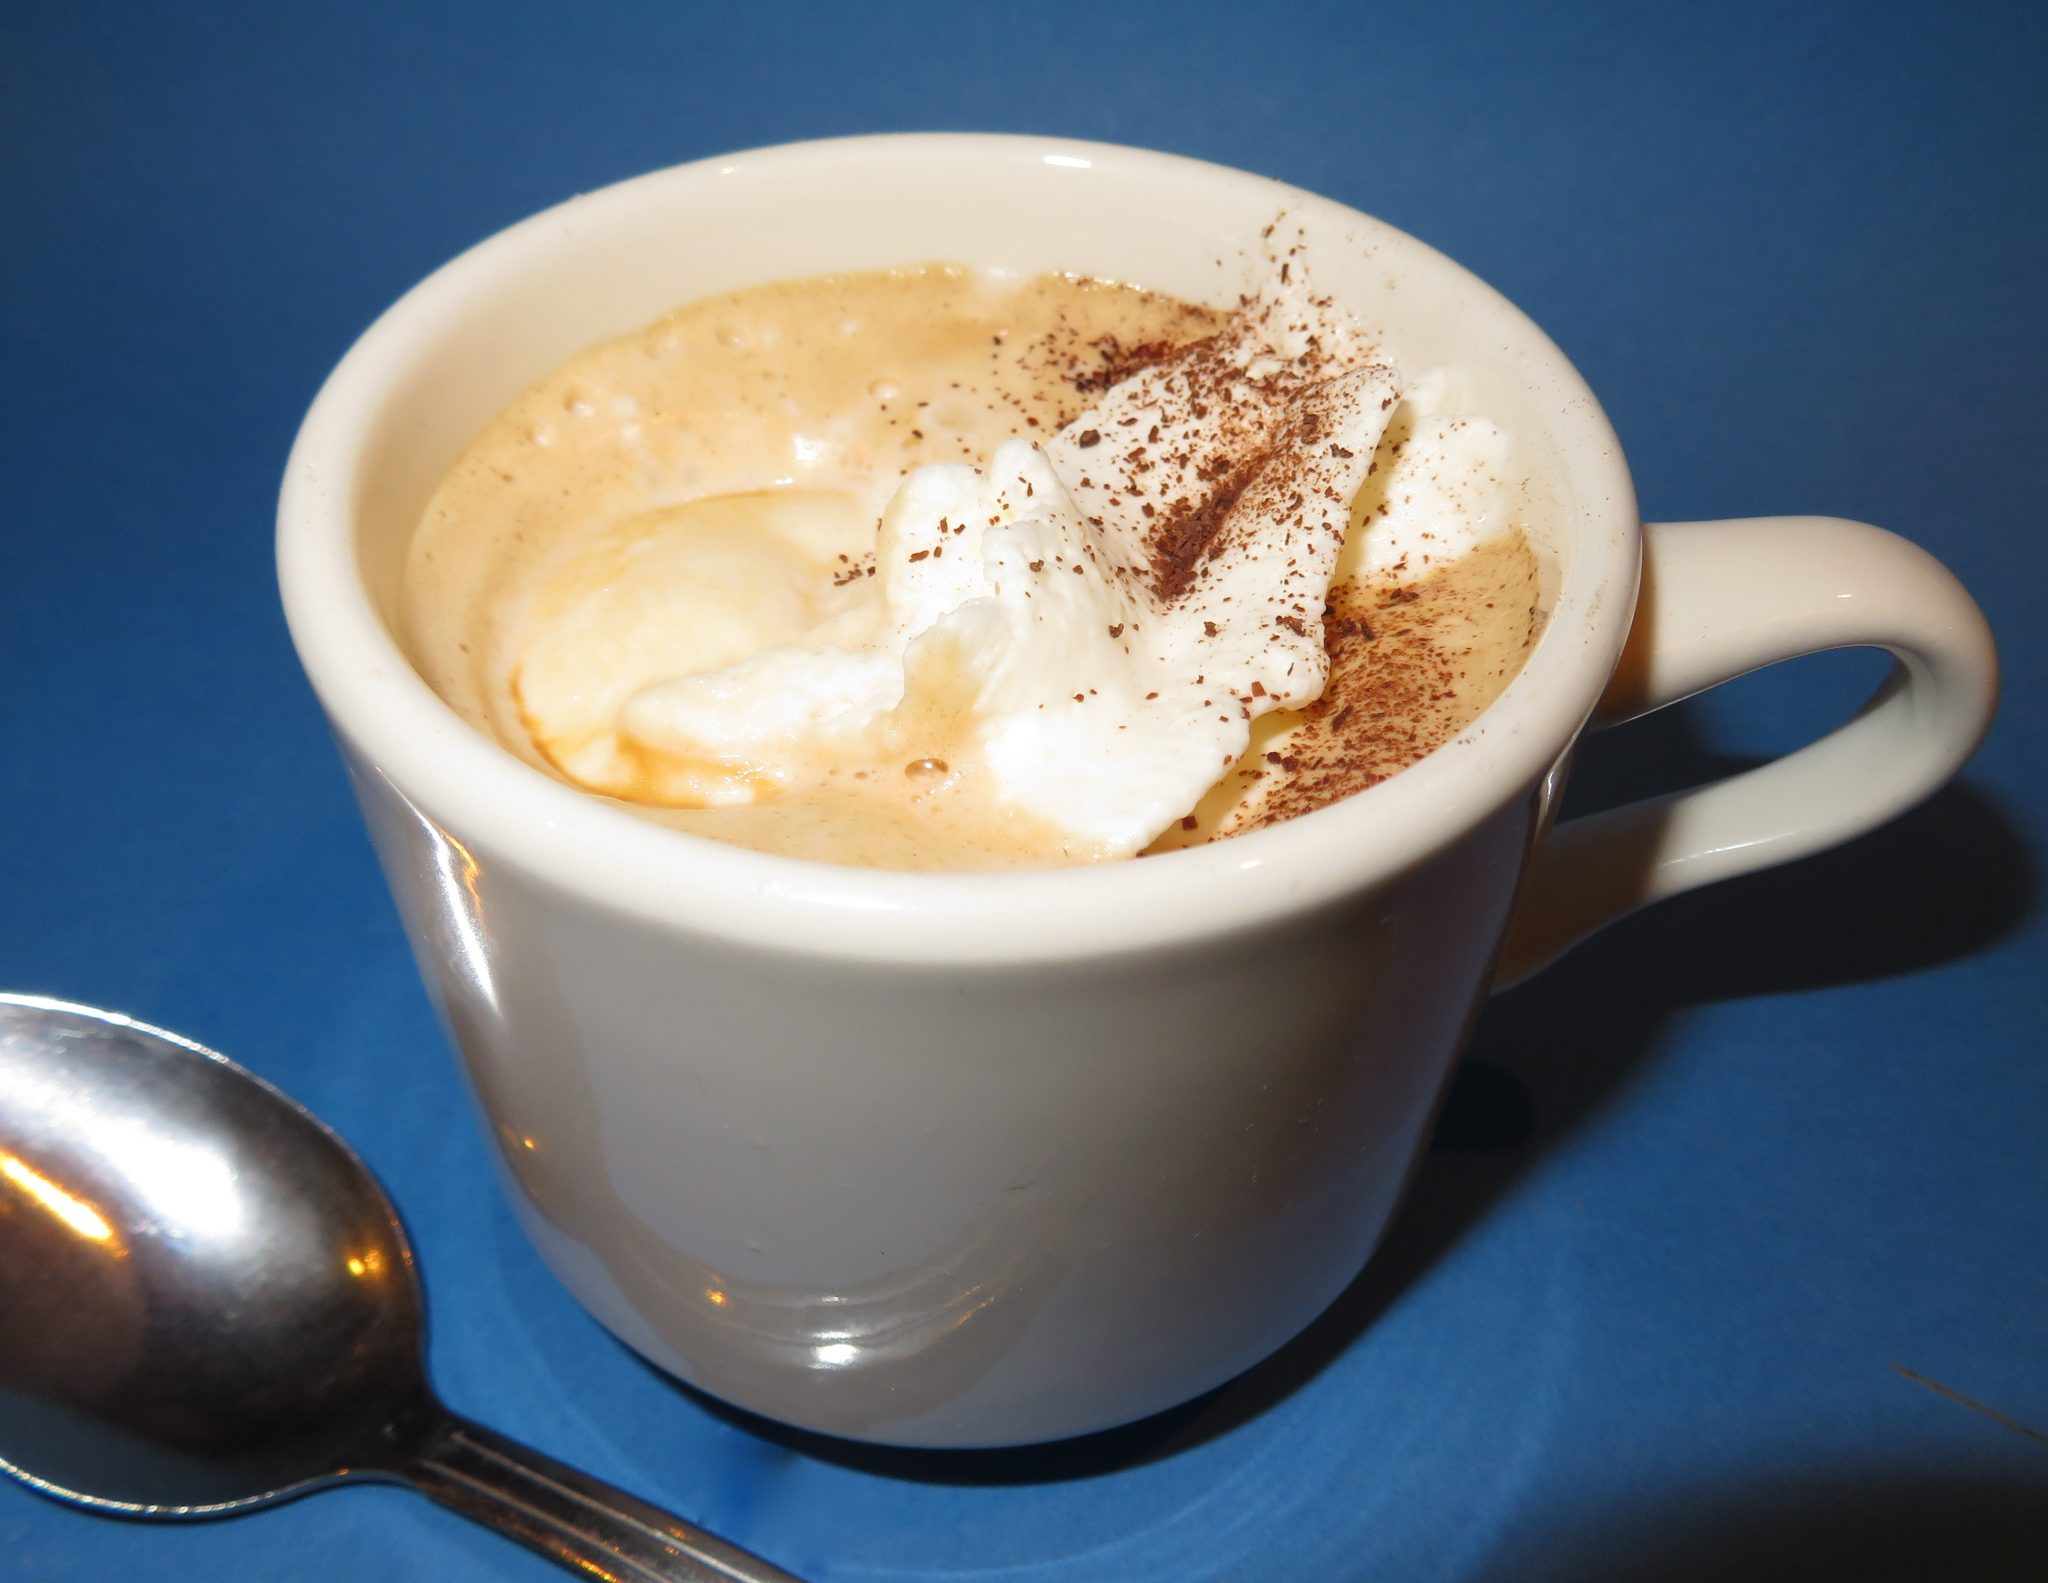 creamy mix of ice cream and espresso